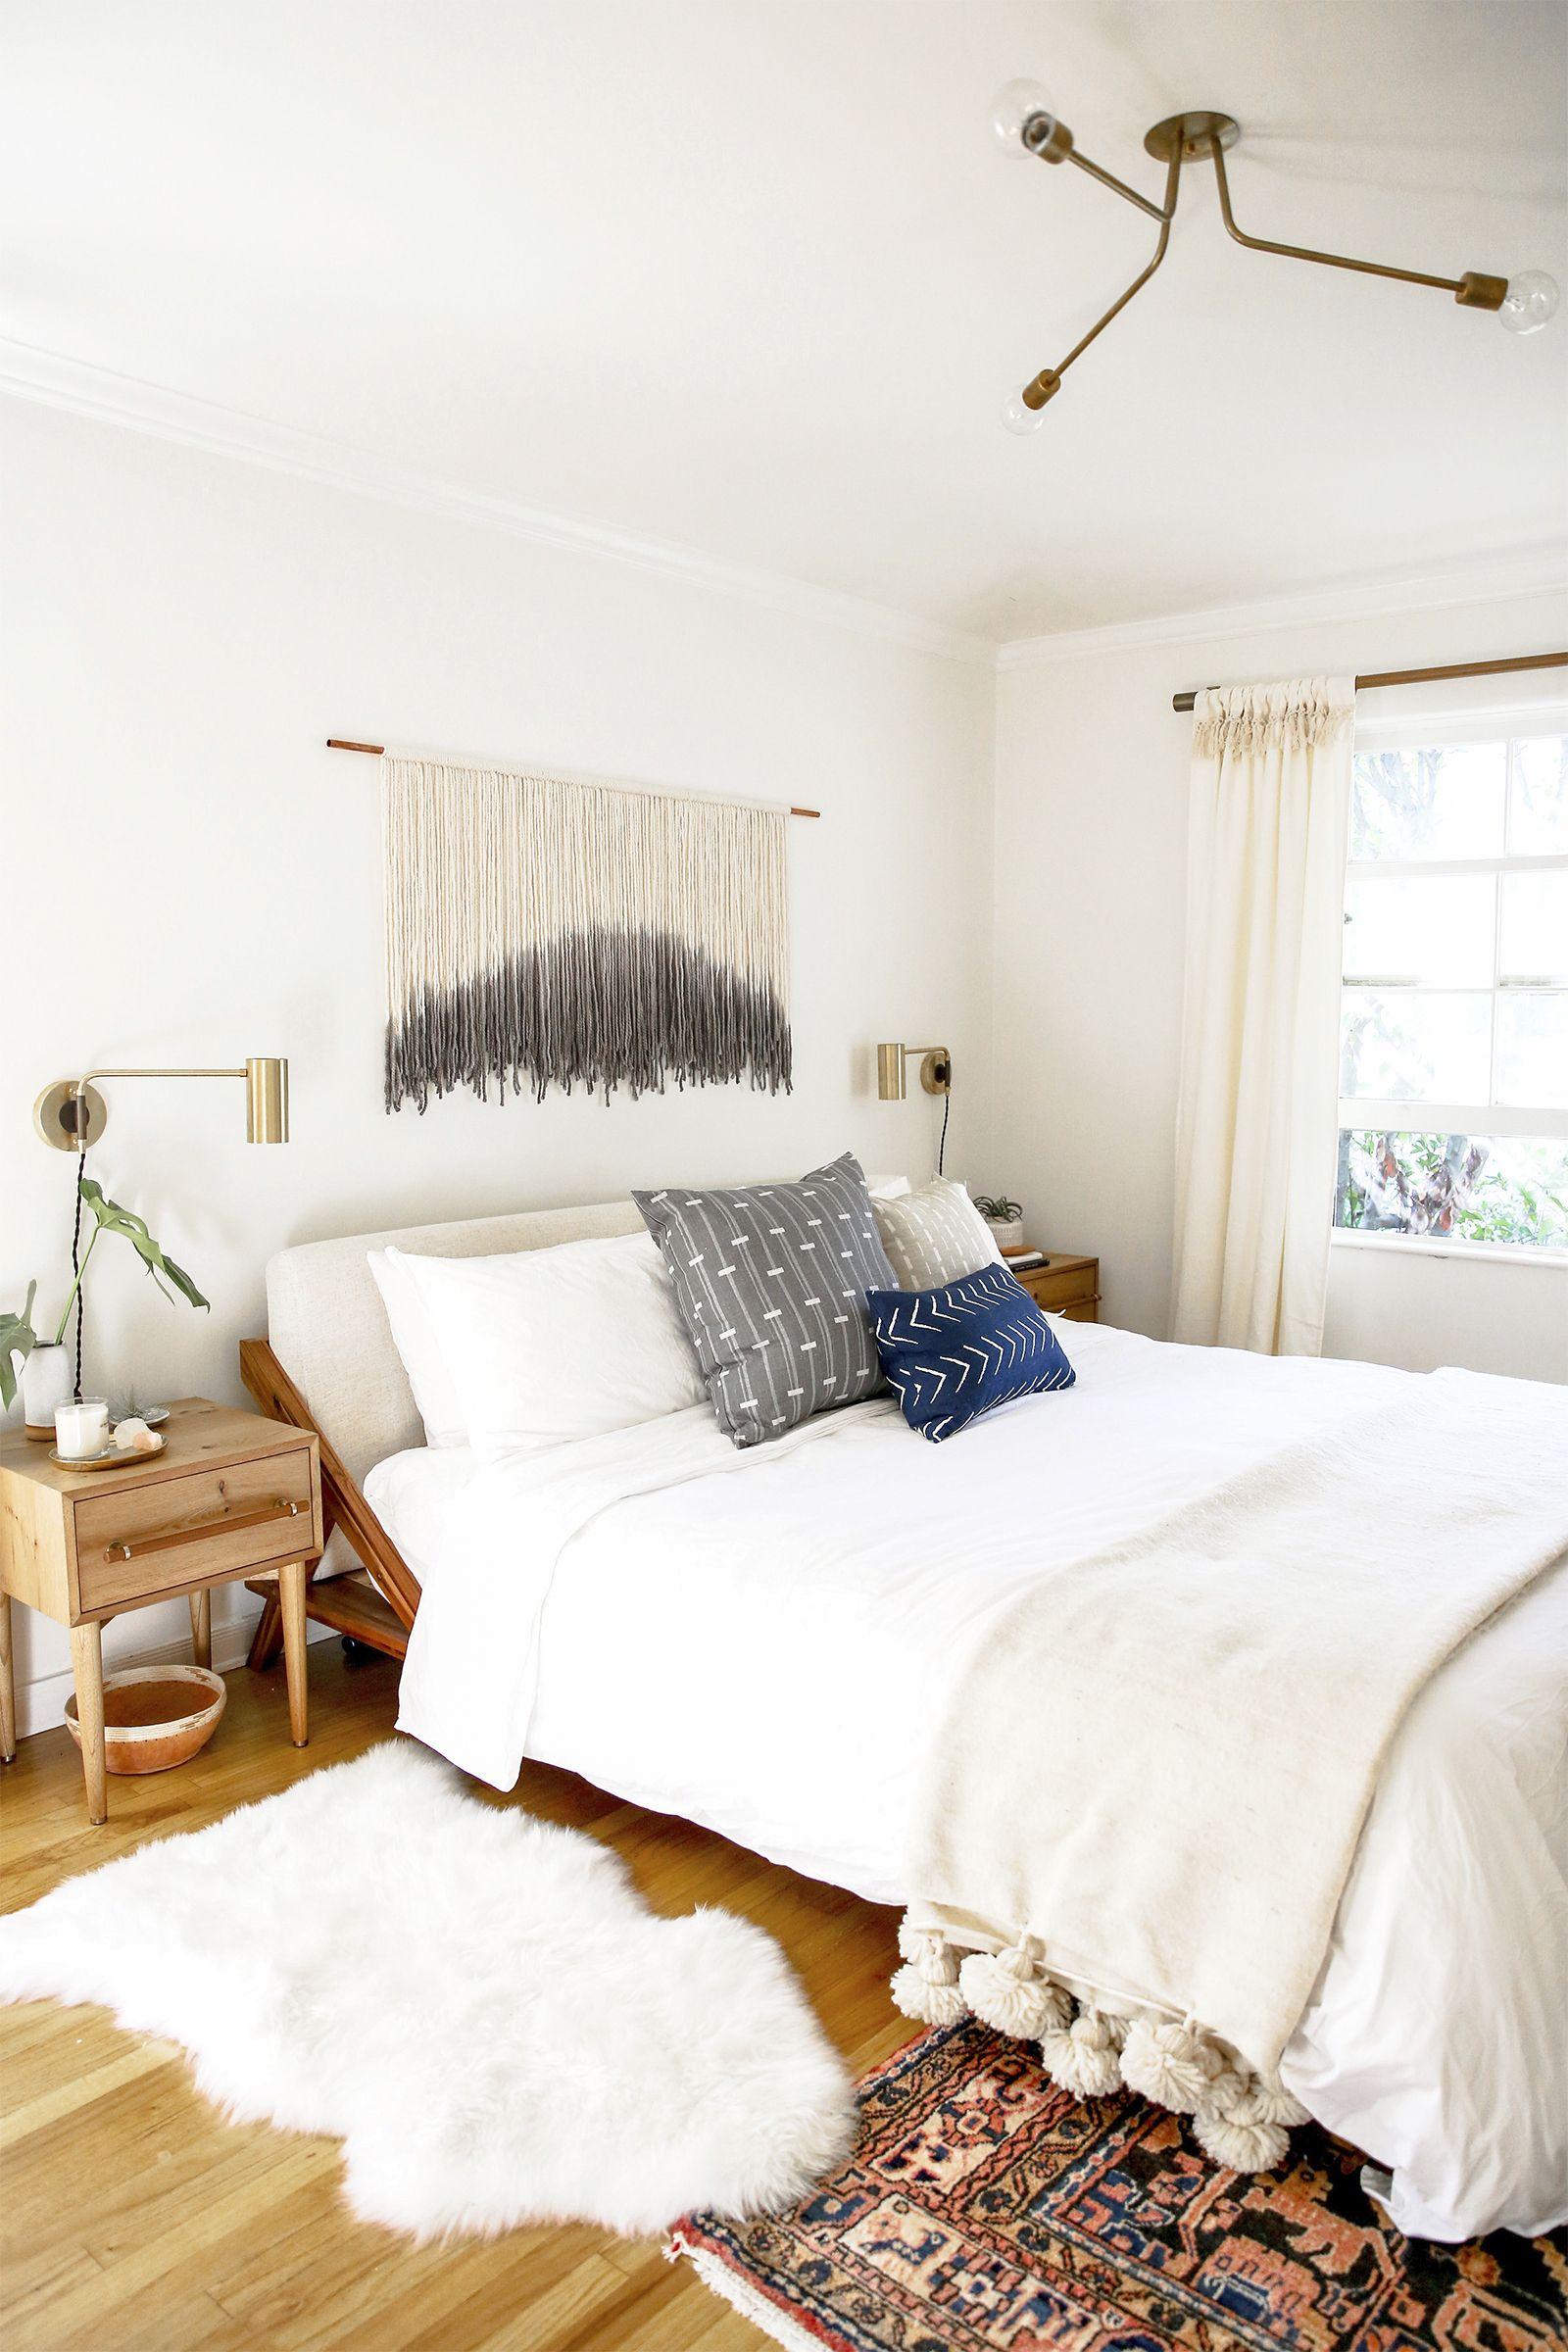 13 Boho Bedroom Ideas Decorating A Bohemian Bedroom On A Budget